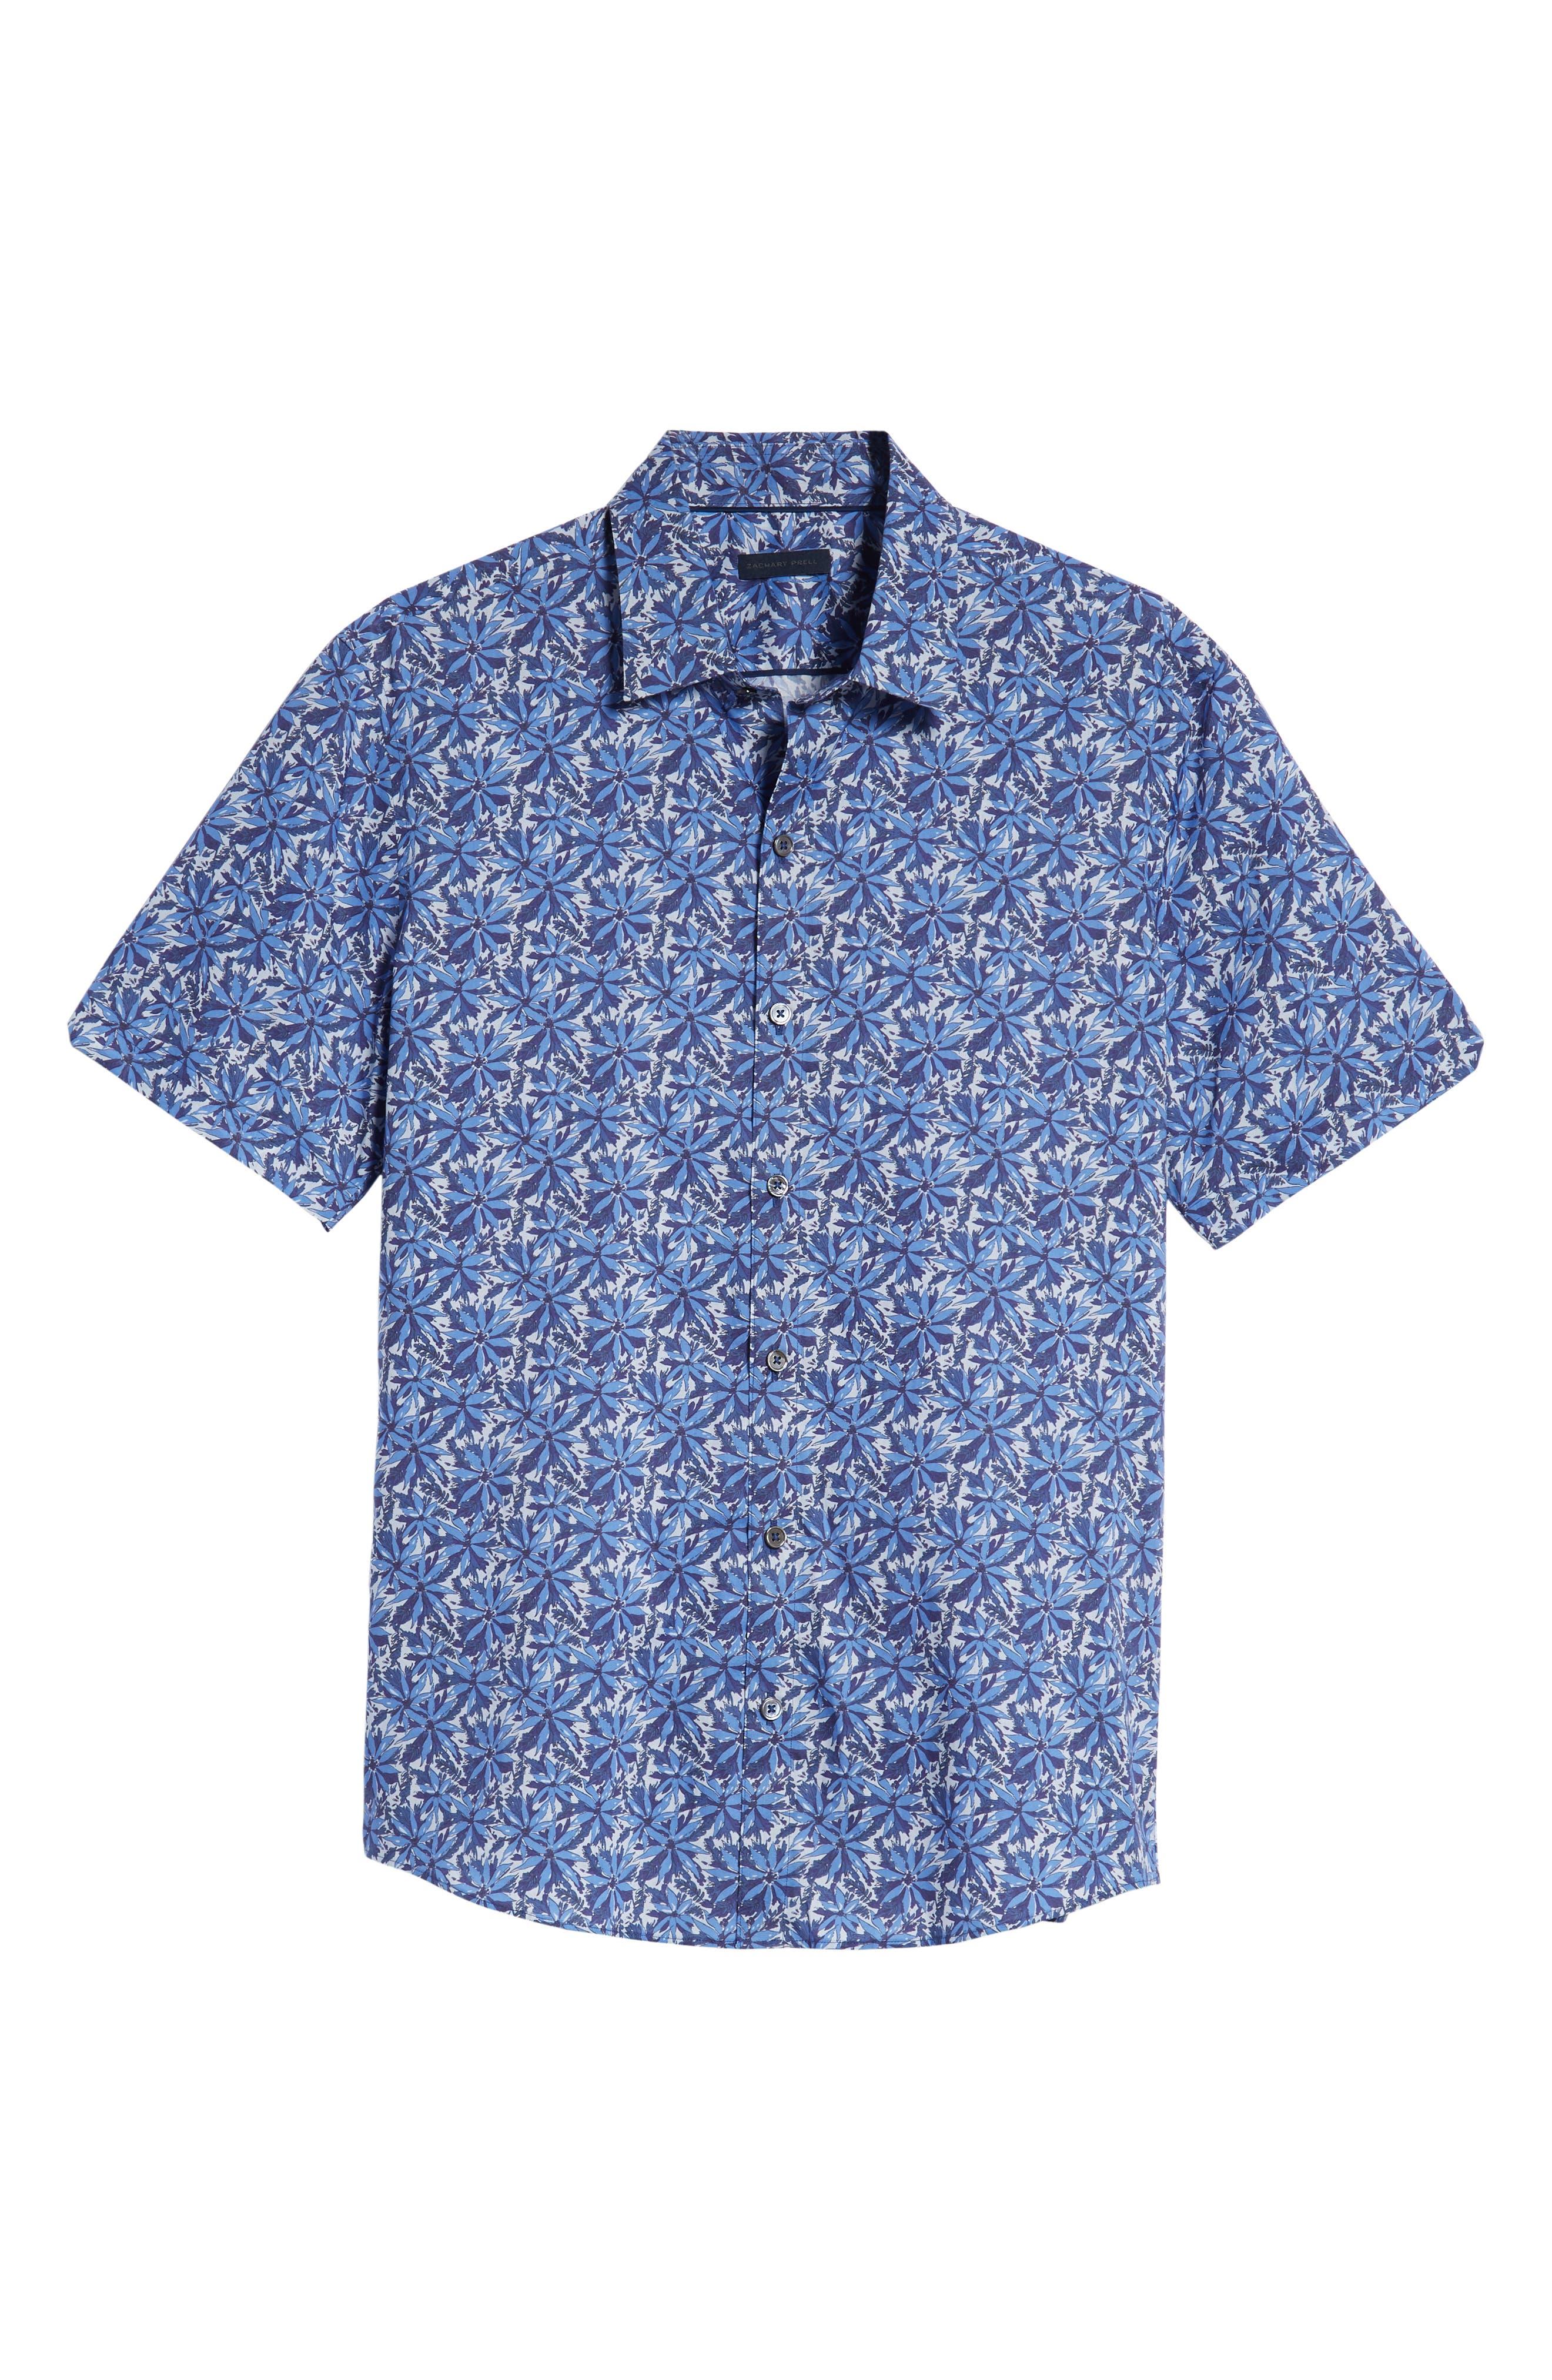 ZACHARY PRELL,                             Ose Regular Fit Sport Shirt,                             Alternate thumbnail 5, color,                             400